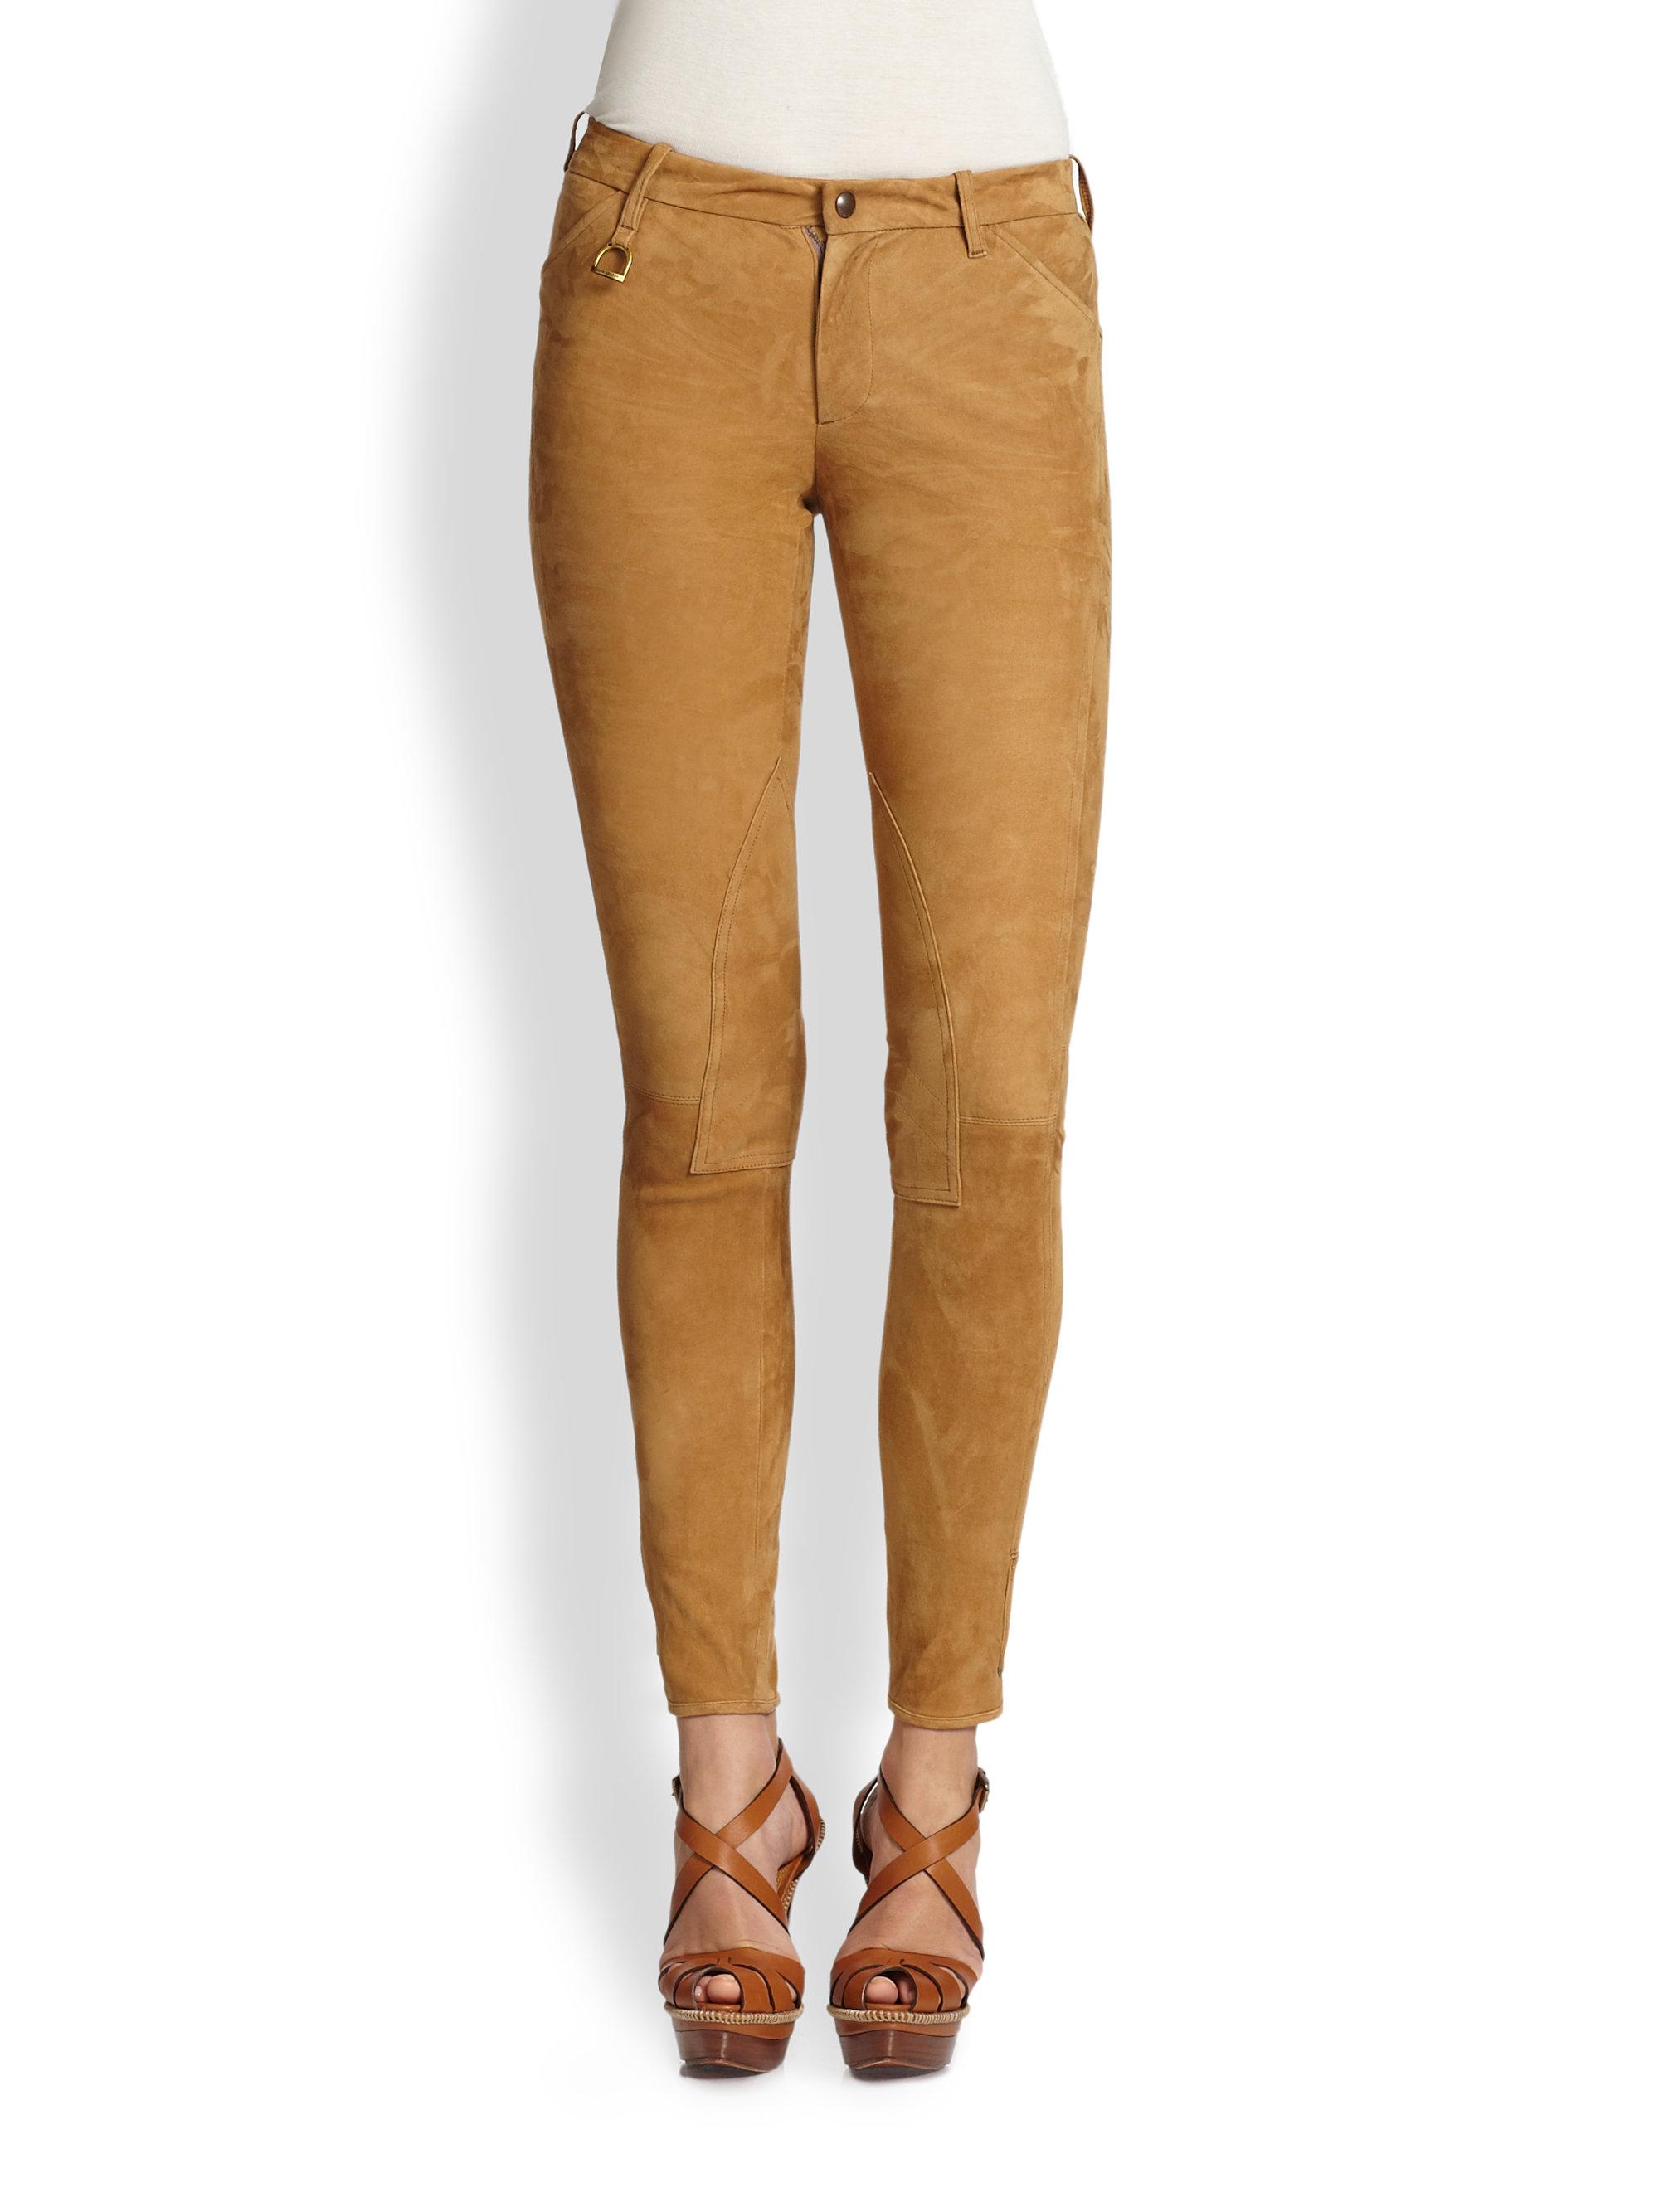 Ralph Lauren Blue Label Suede Palermo Jodhpur Pants In